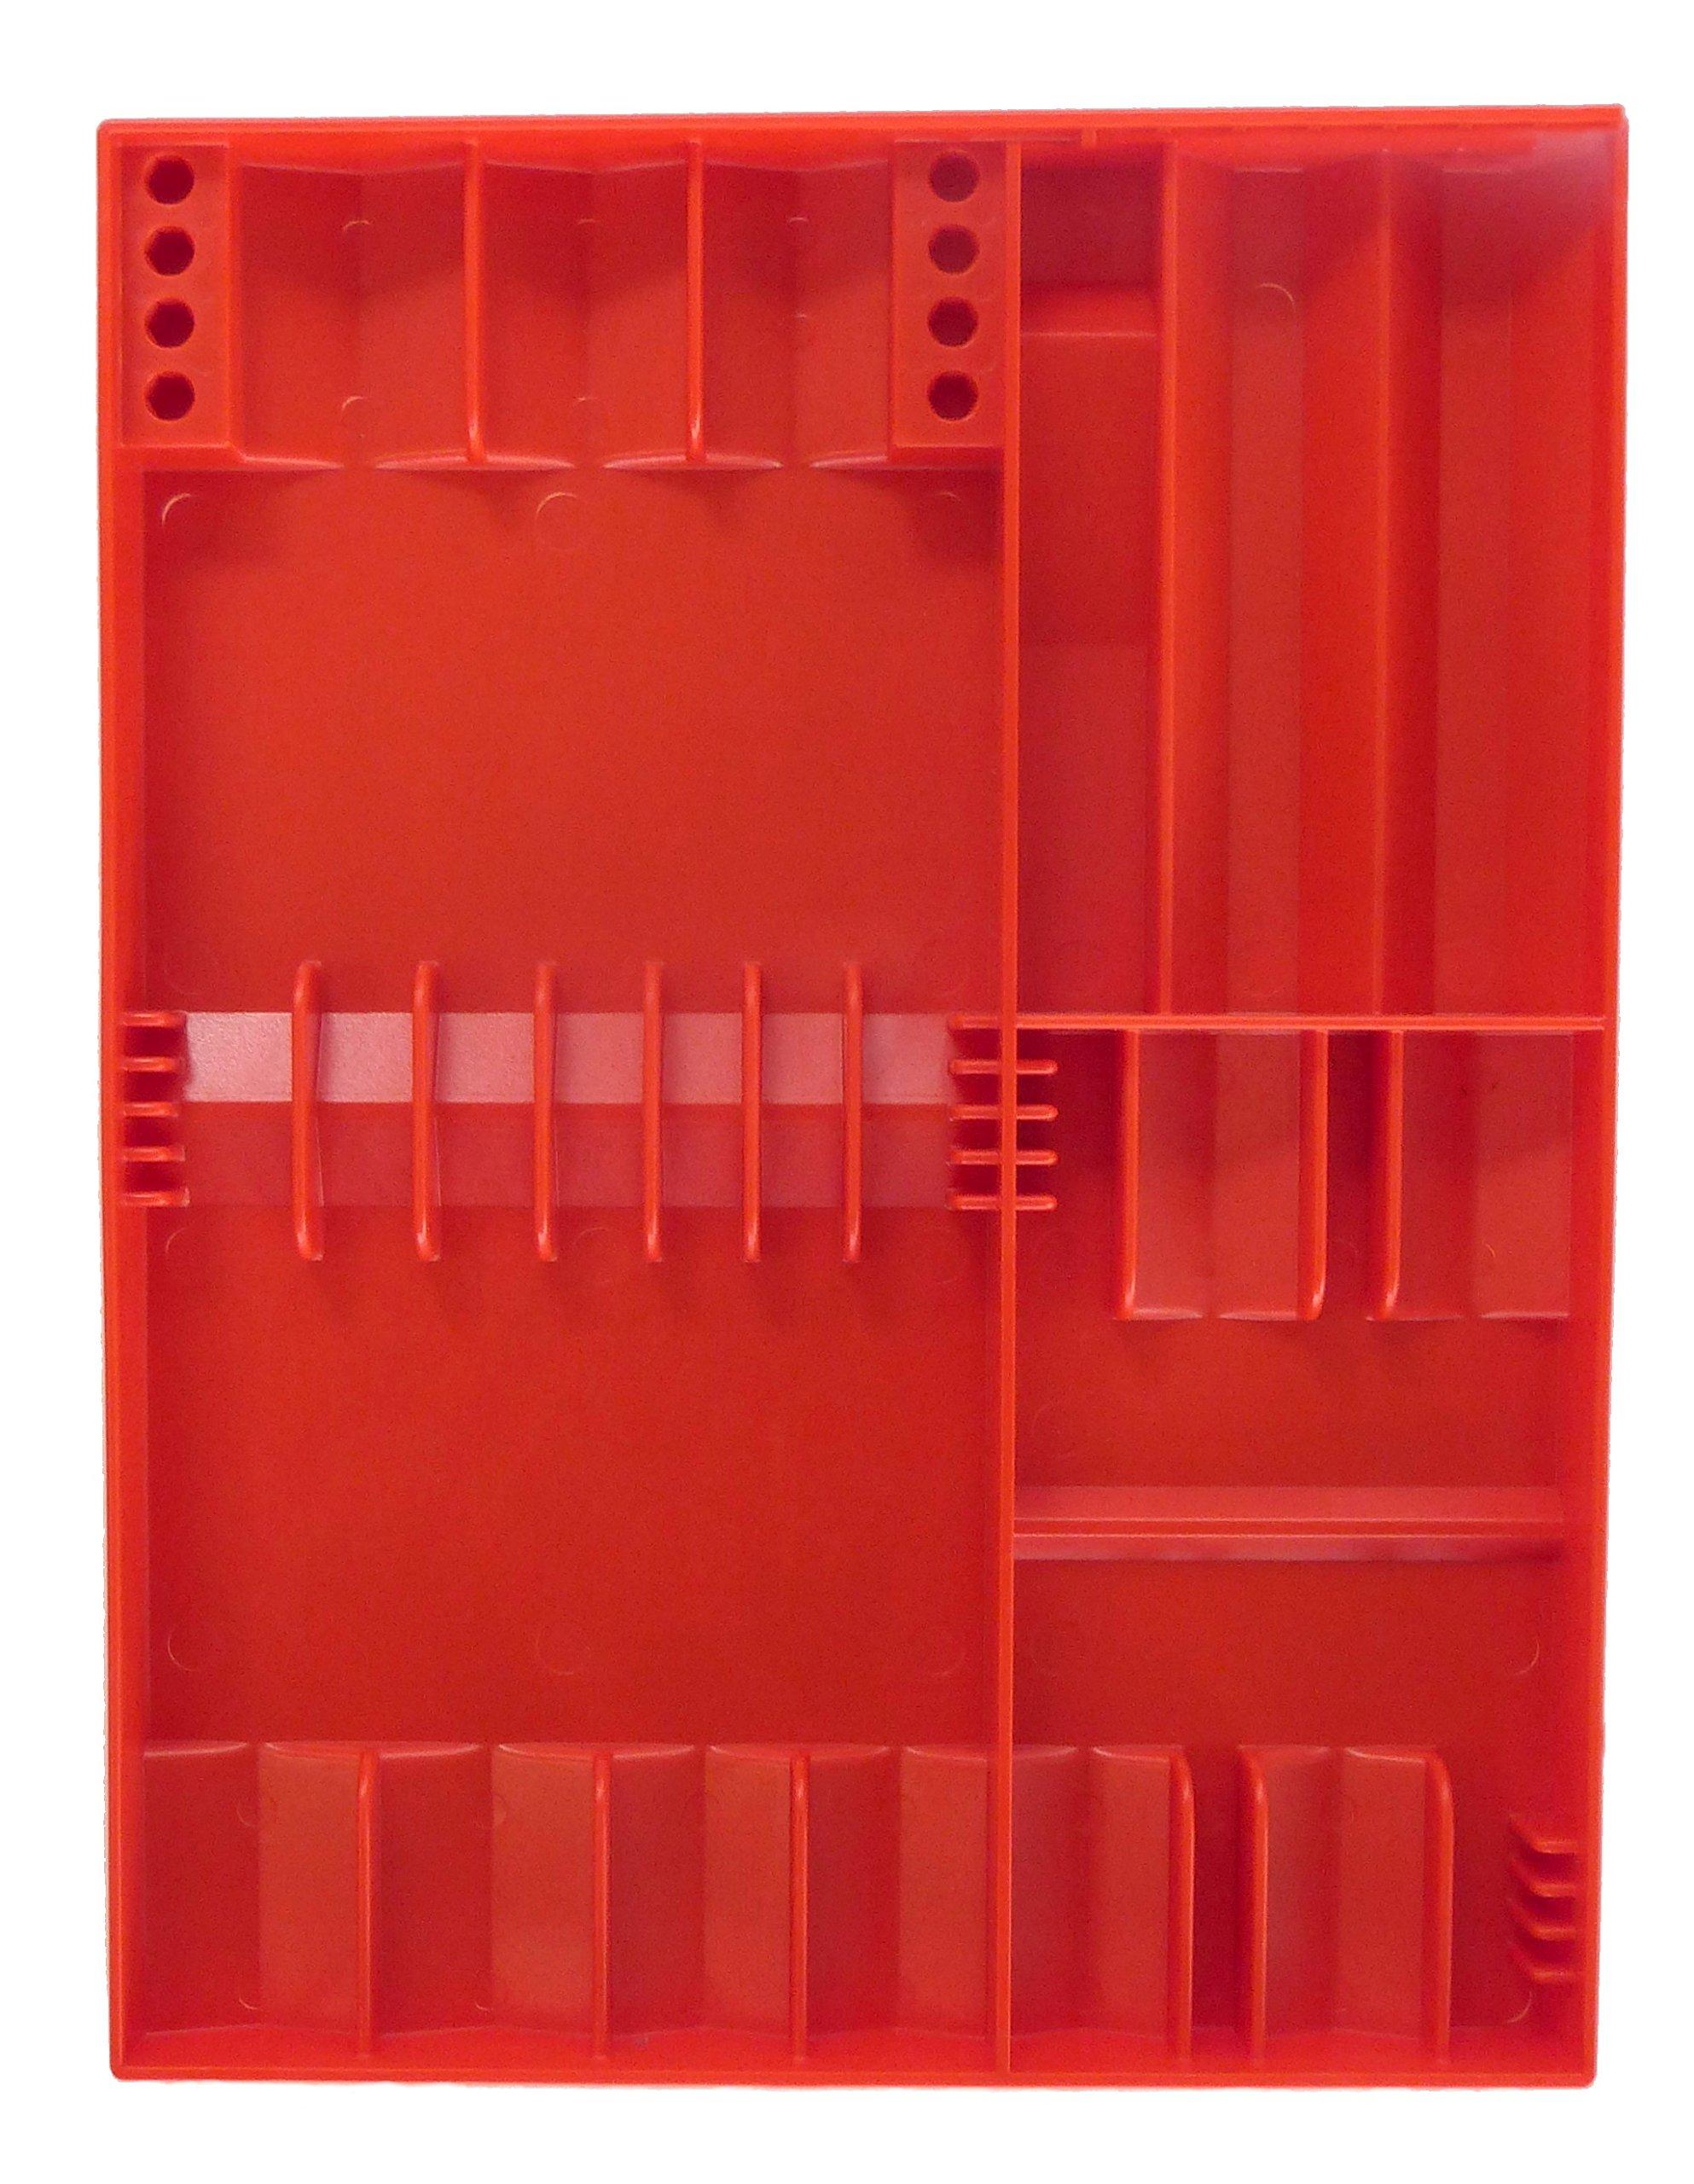 Tool Sorter Screwdriver Organizer - Red